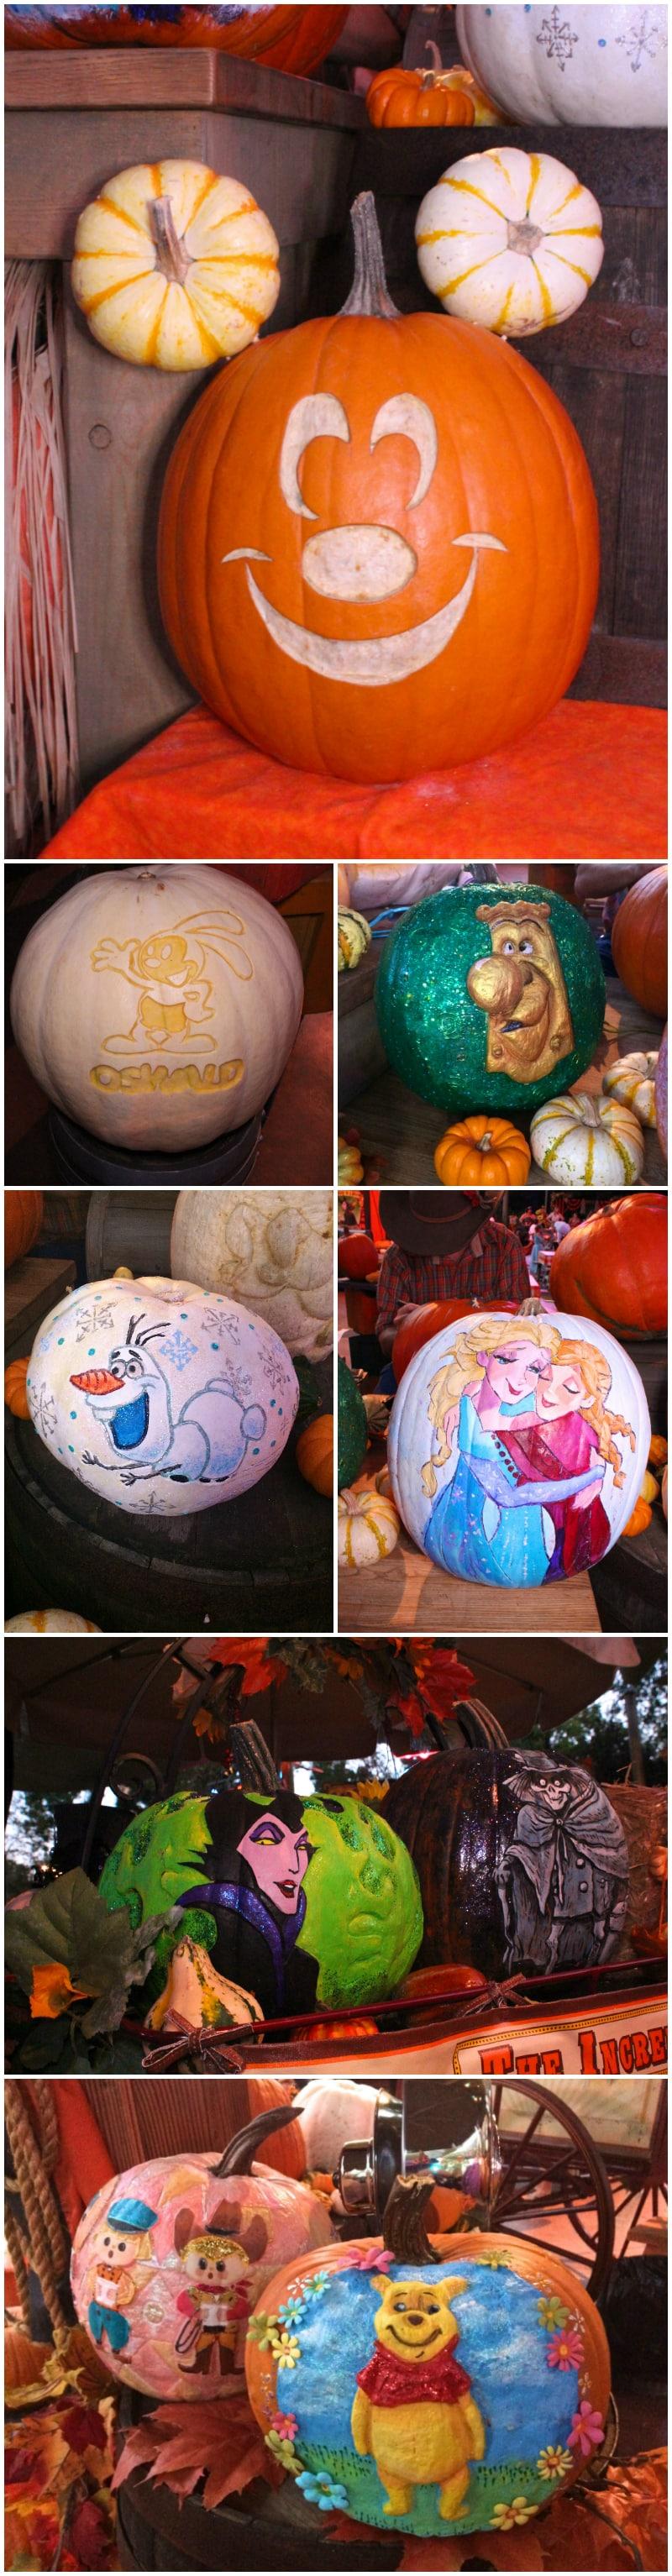 Disney-Halloween-Pumpkins